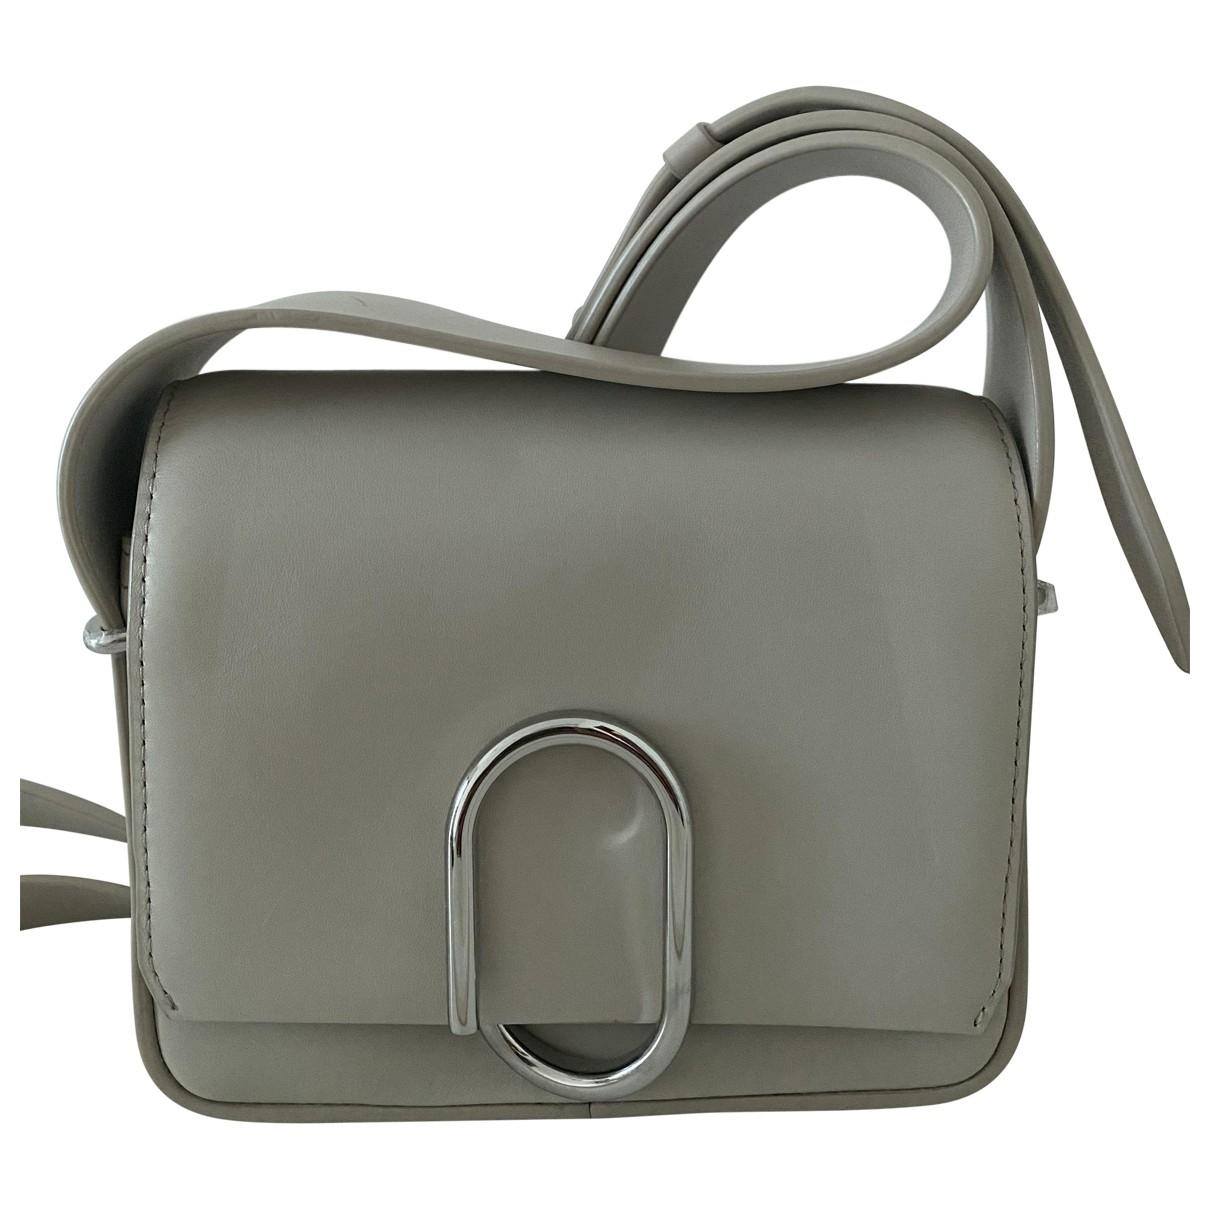 3.1 Phillip Lim Alix Handtasche in  Beige Leder